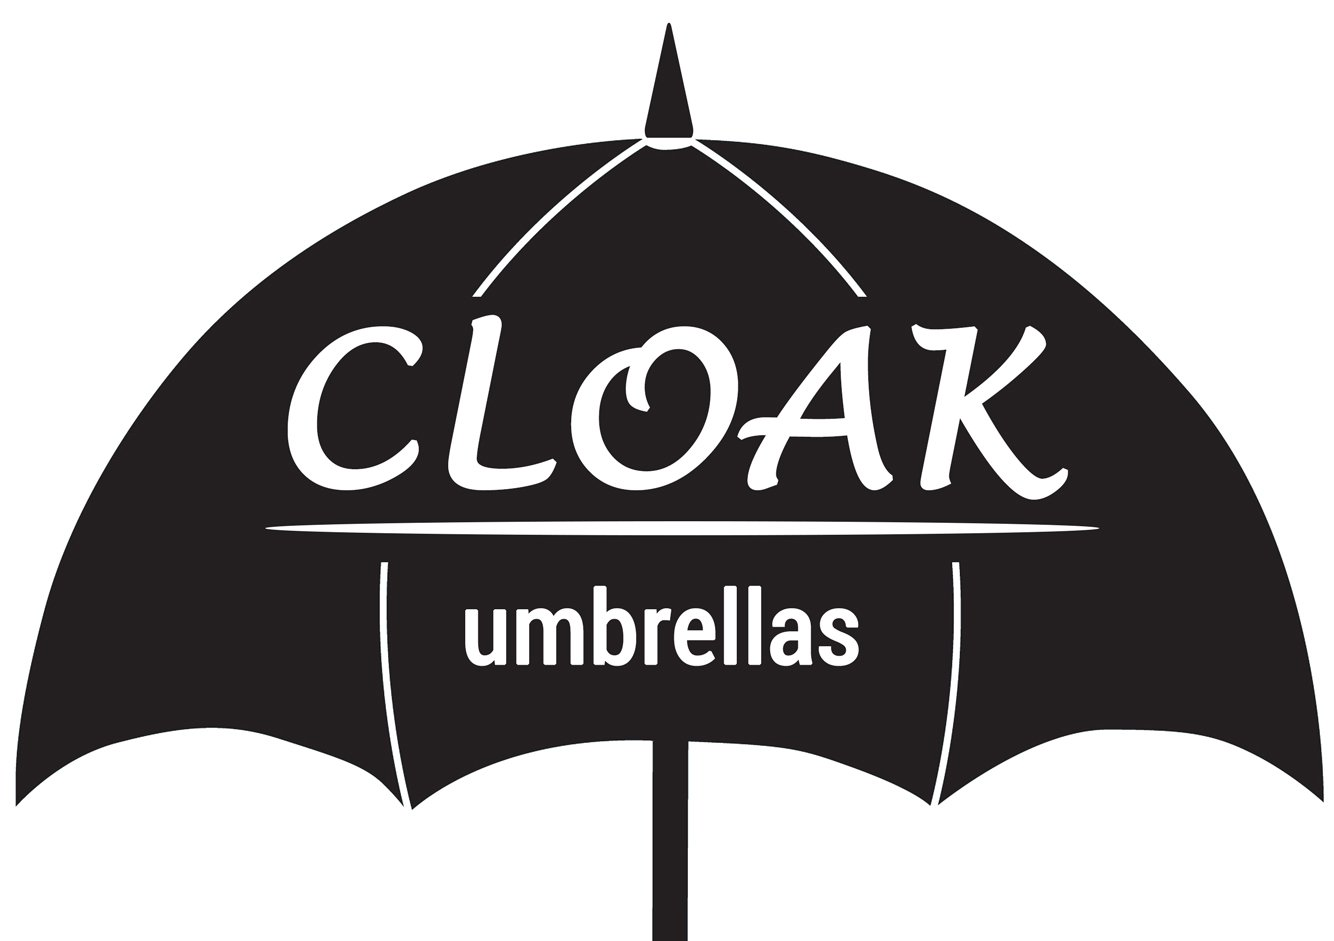 Cloak Umbrellas Auto Open Clear Umbrellas, 46'' ARC by Cloak Umbrellas (Image #5)